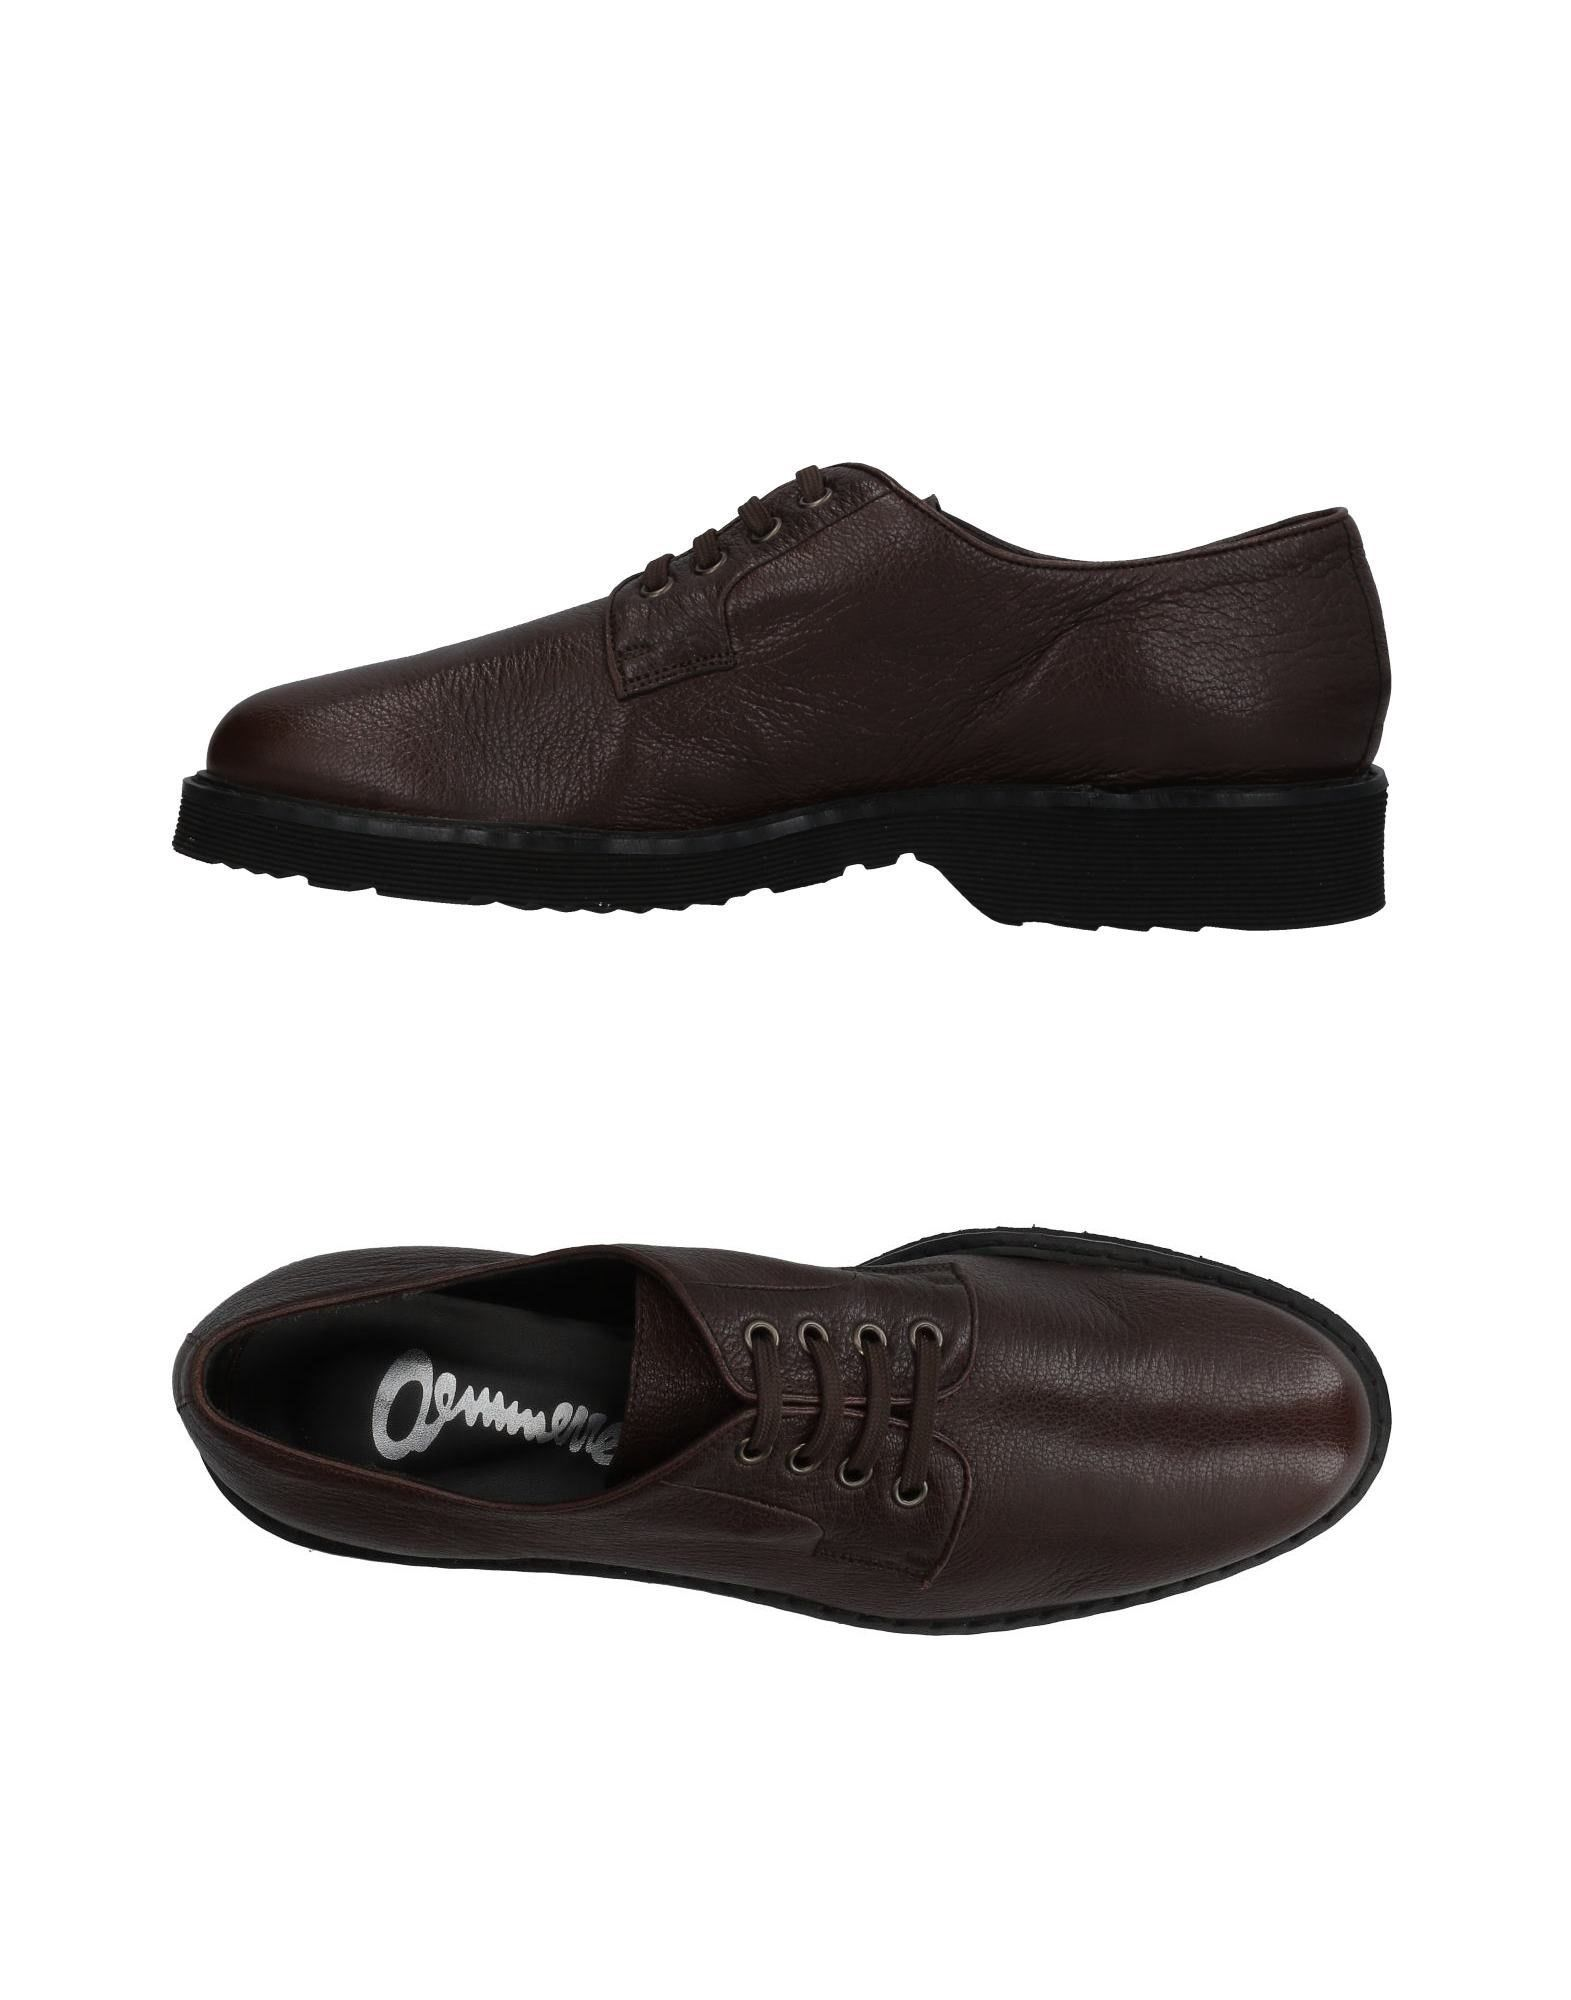 Amr Aemmerre Schnürschuhe Damen  11413618BM Gute Qualität beliebte Schuhe